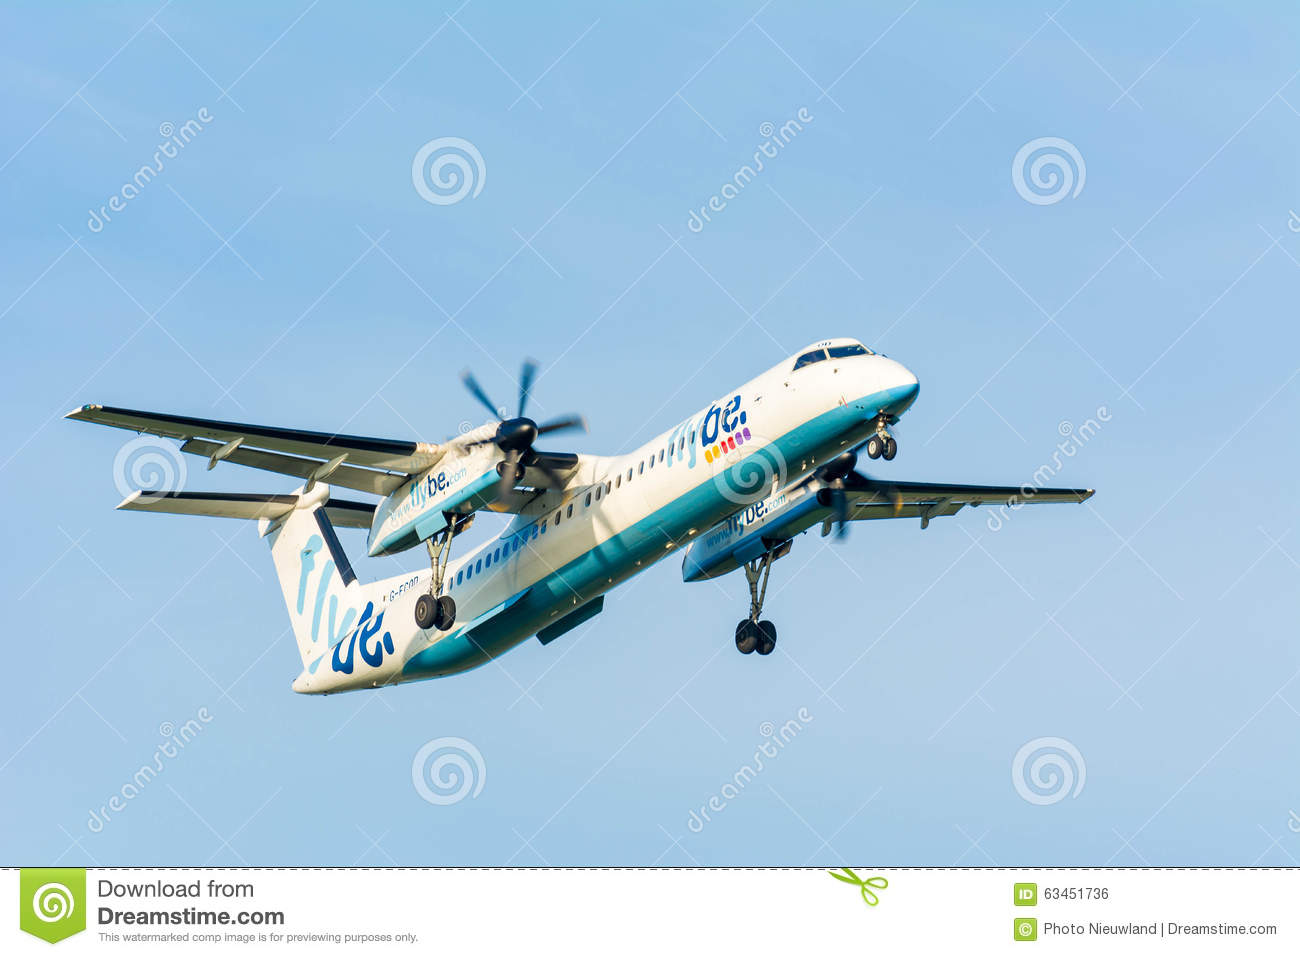 Plane From Flybe De Havilland Canada G.